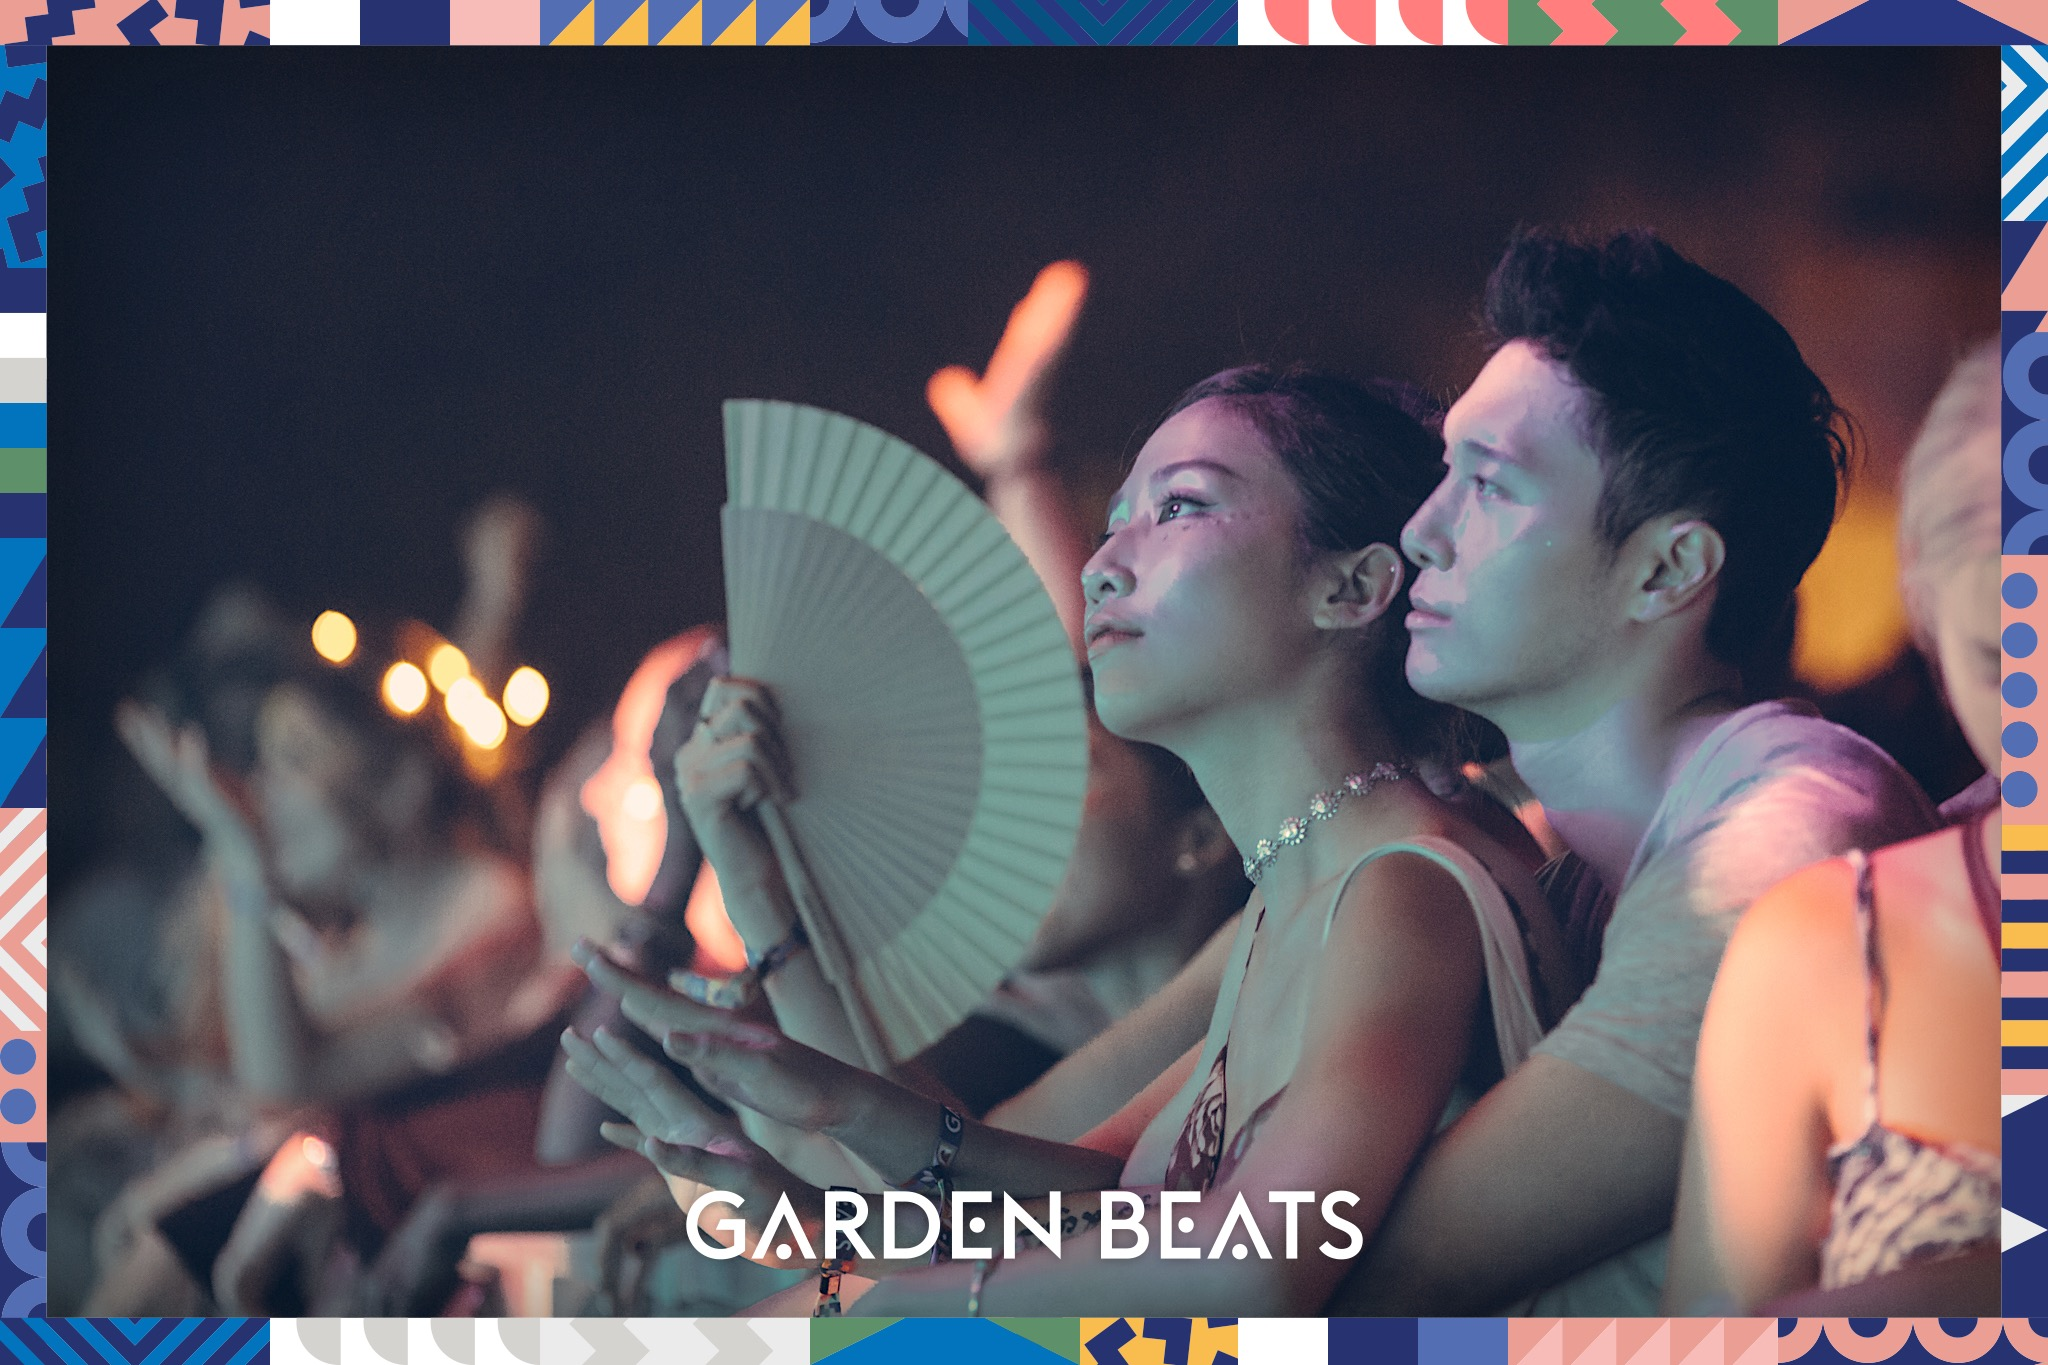 18032017_GardenBeats_Colossal756_WatermarkedGB.jpg